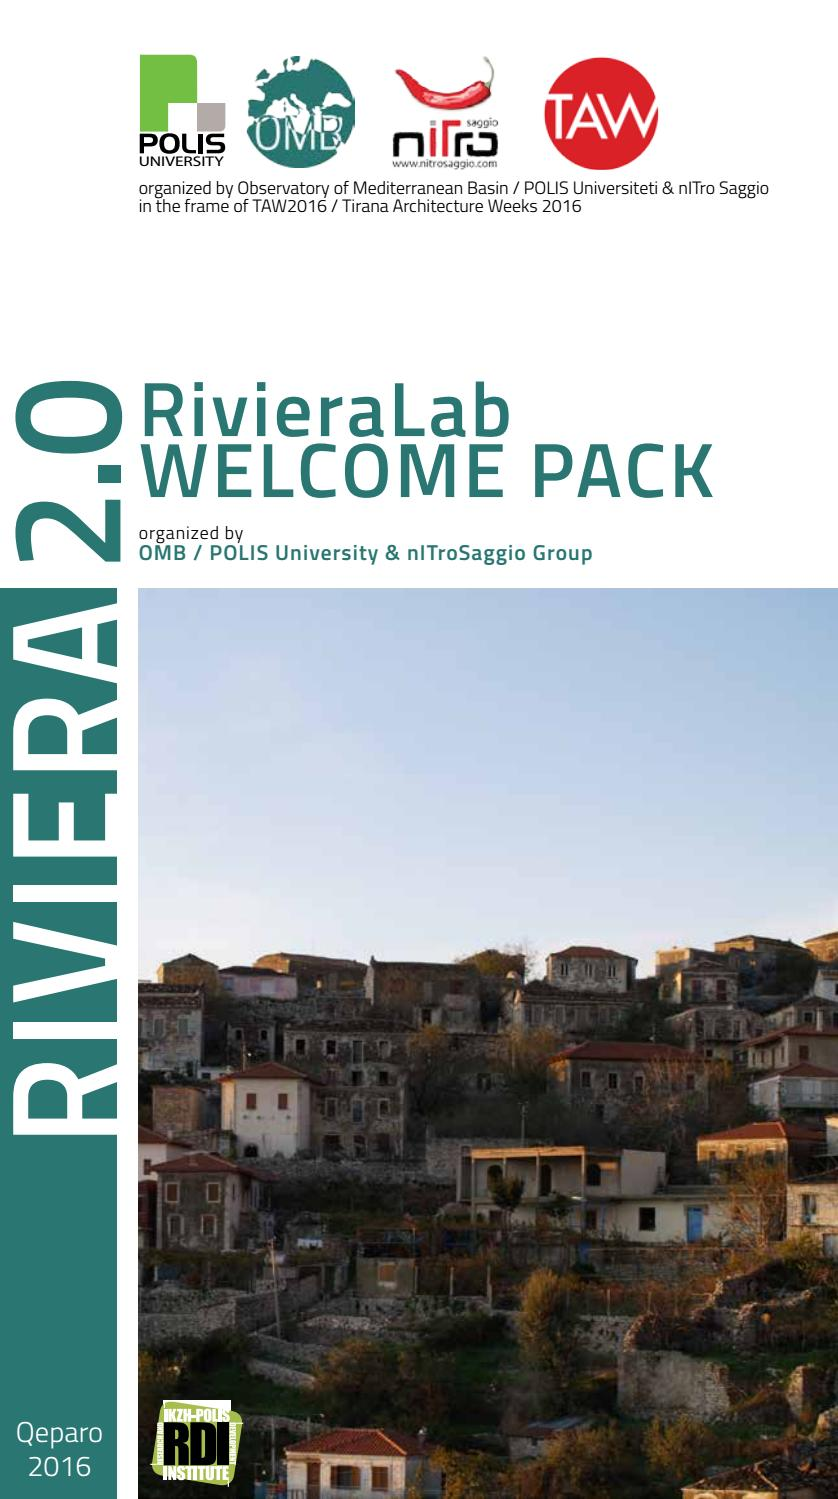 Rivieralab2016 welcomepack by POLIS University - issuu